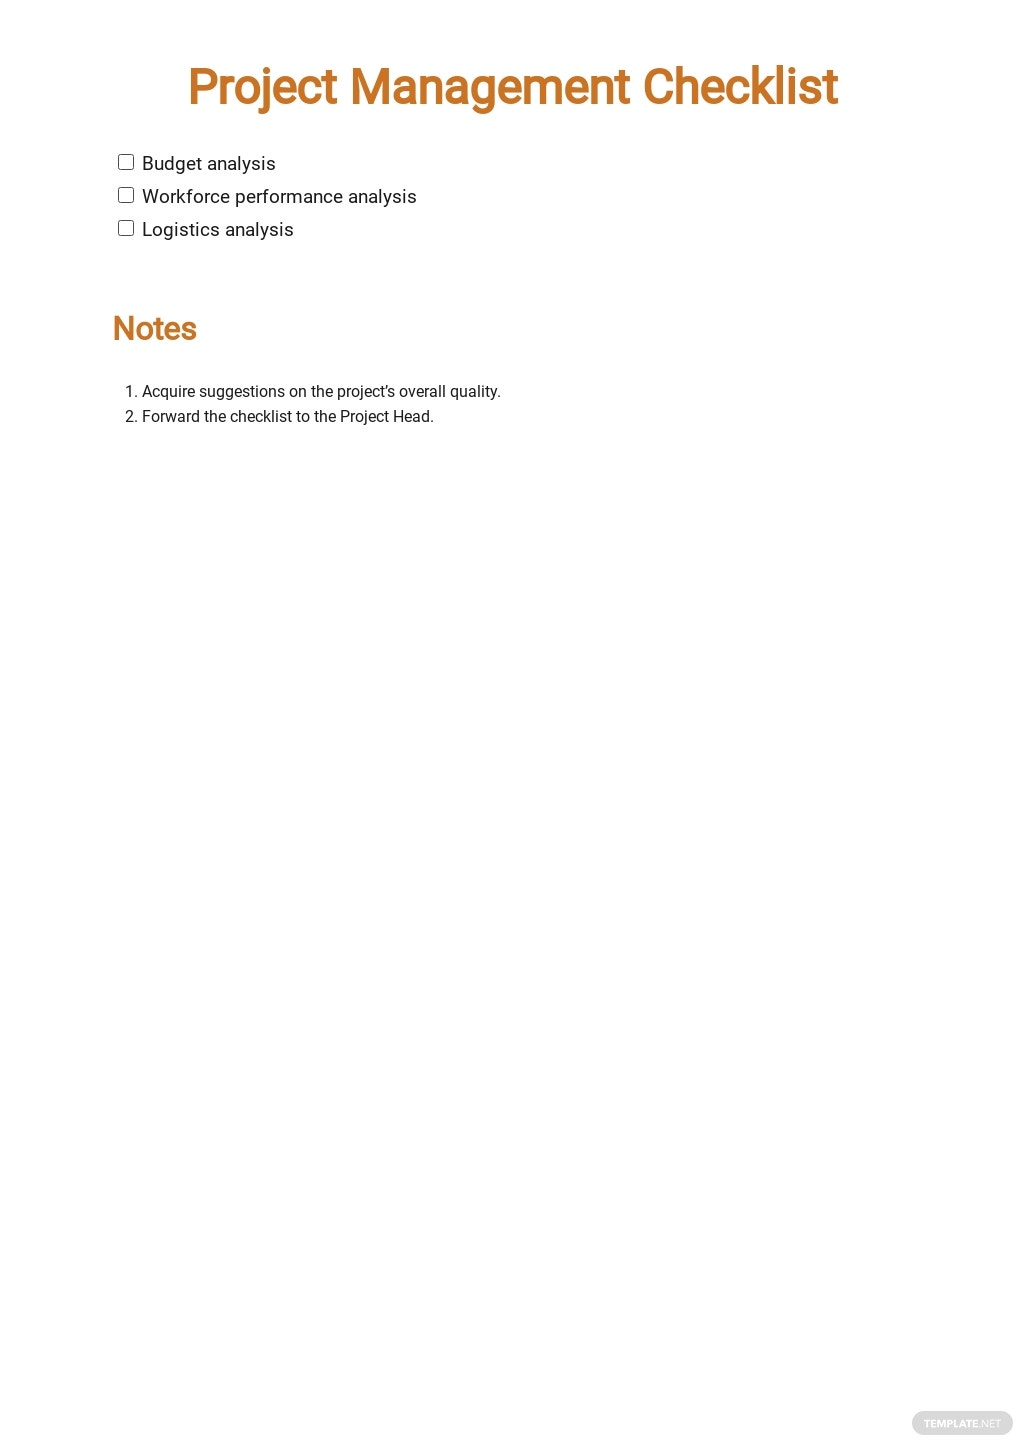 Project Management Checklist Template.jpe